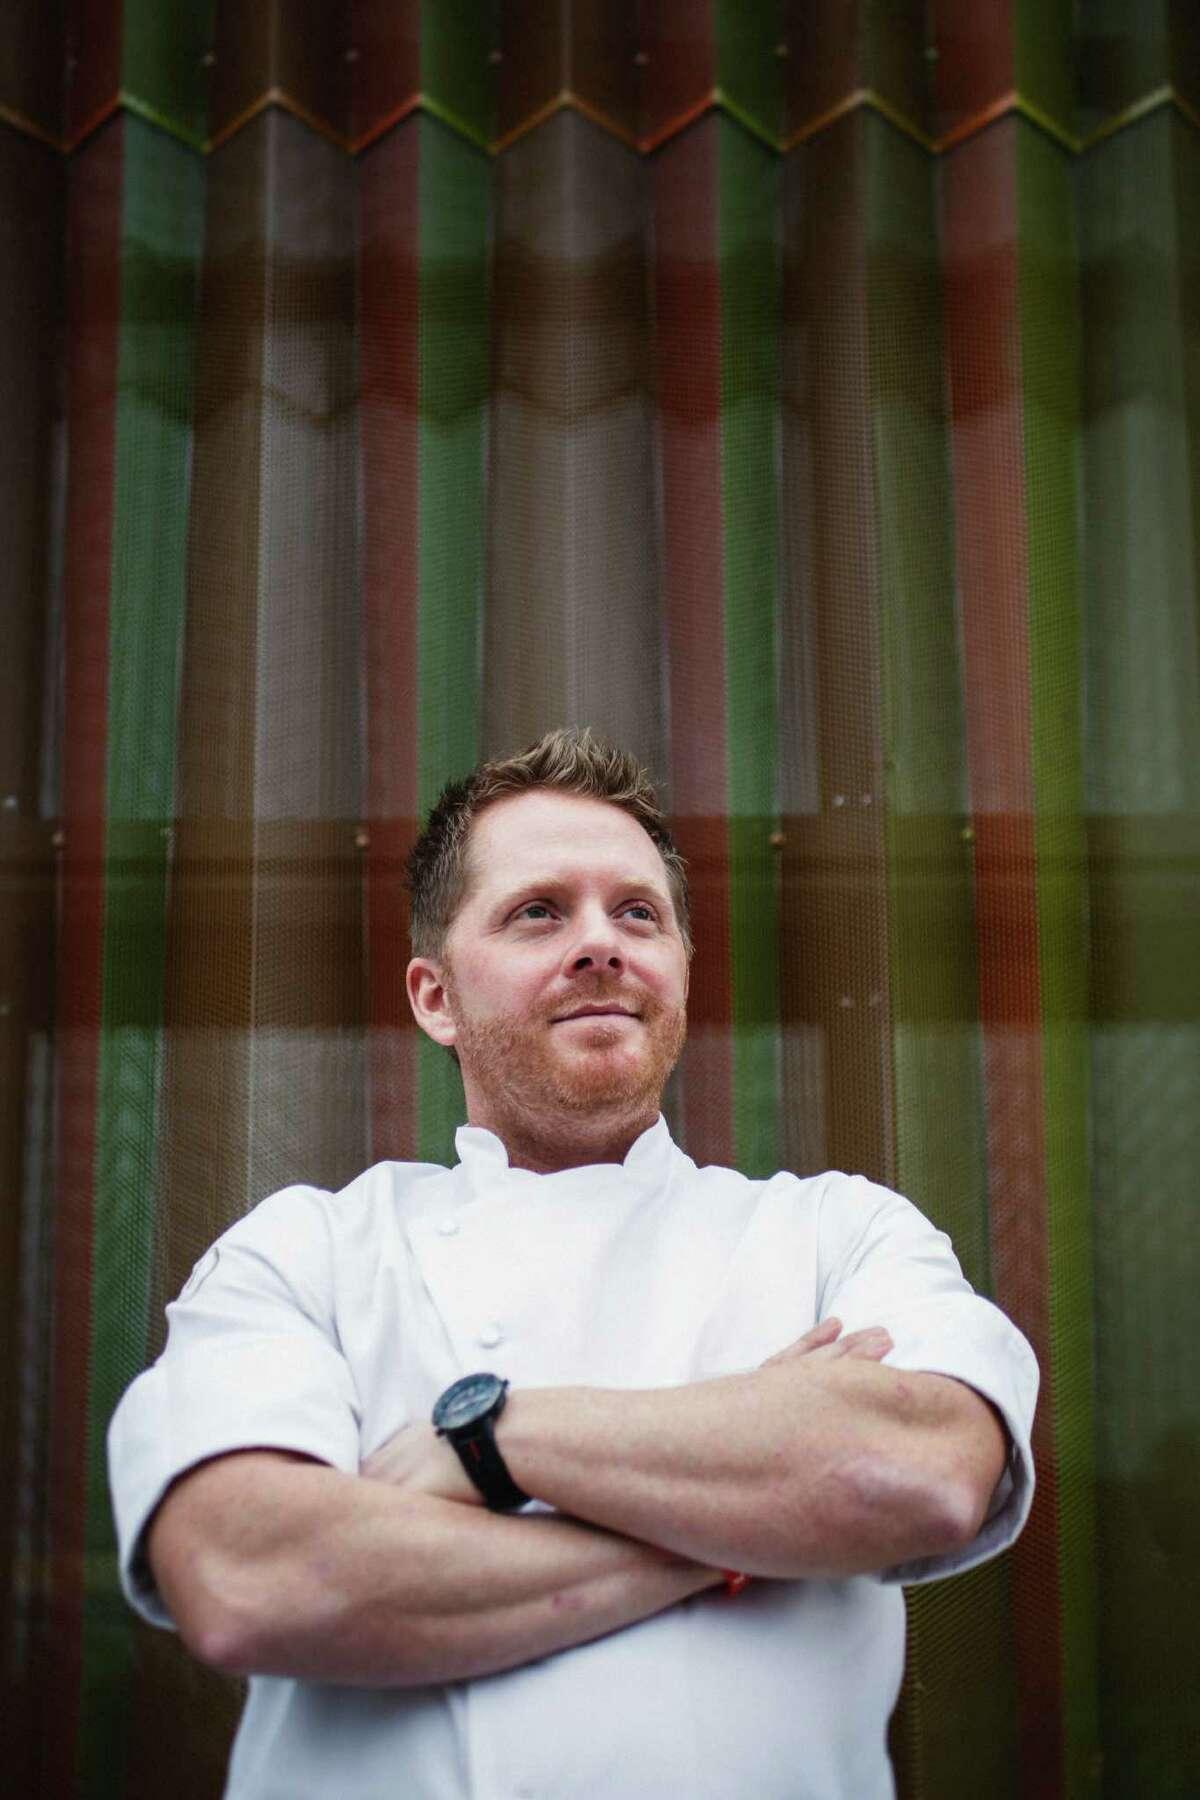 Chef Ryan Hildebrand poses for a photo at his restaurant, Triniti.